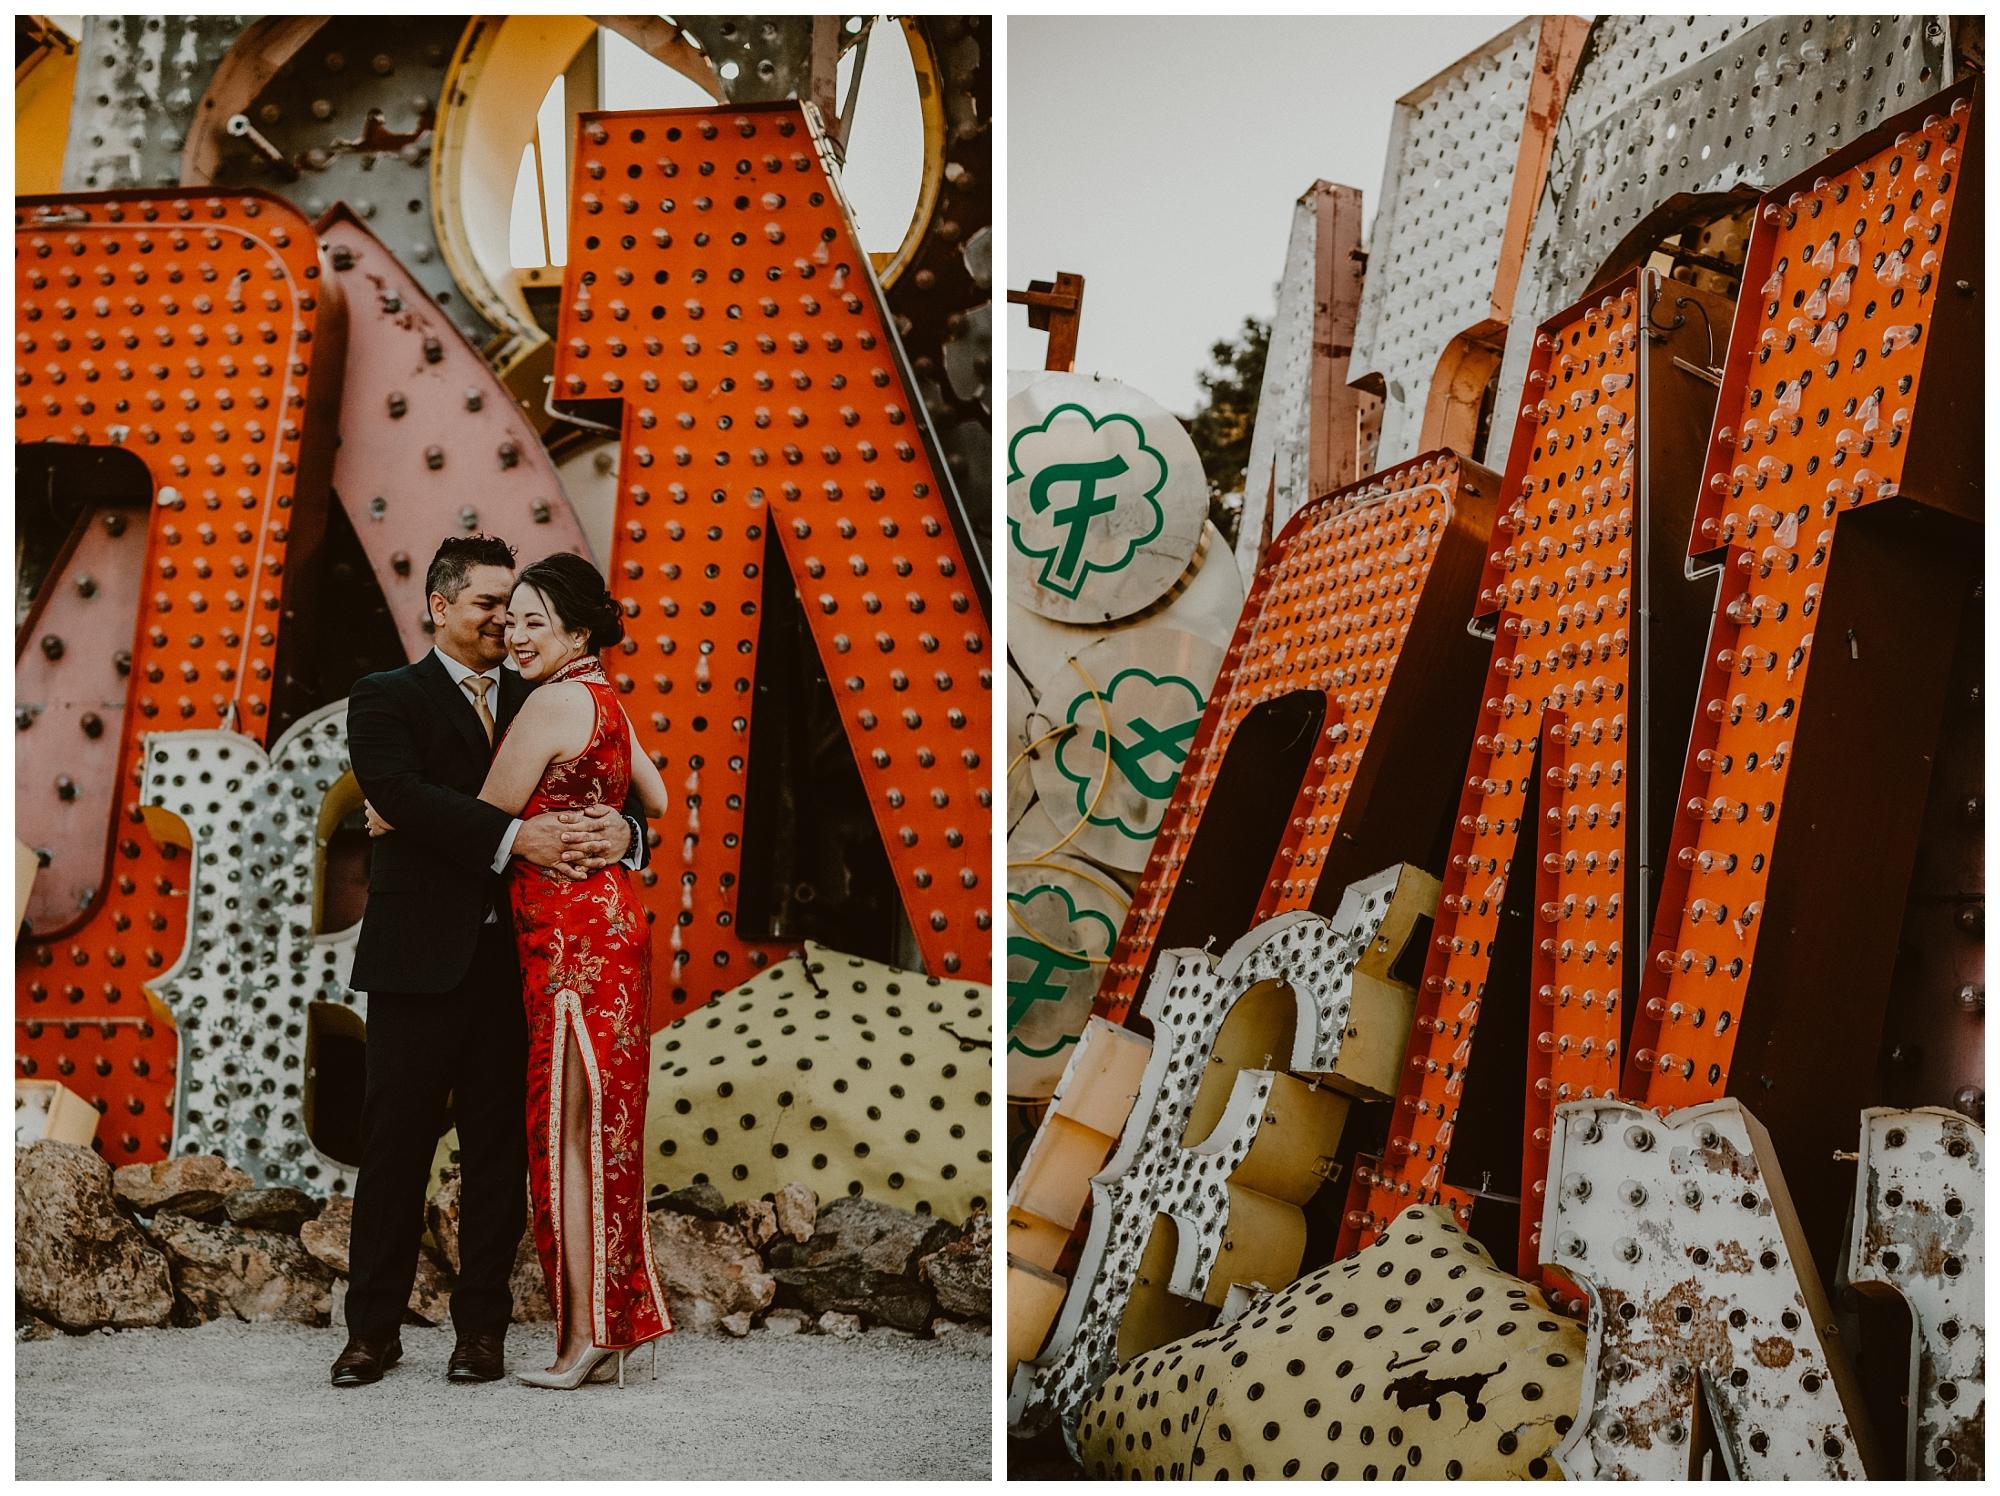 Las Vegas Wedding Boneyard (15).jpg